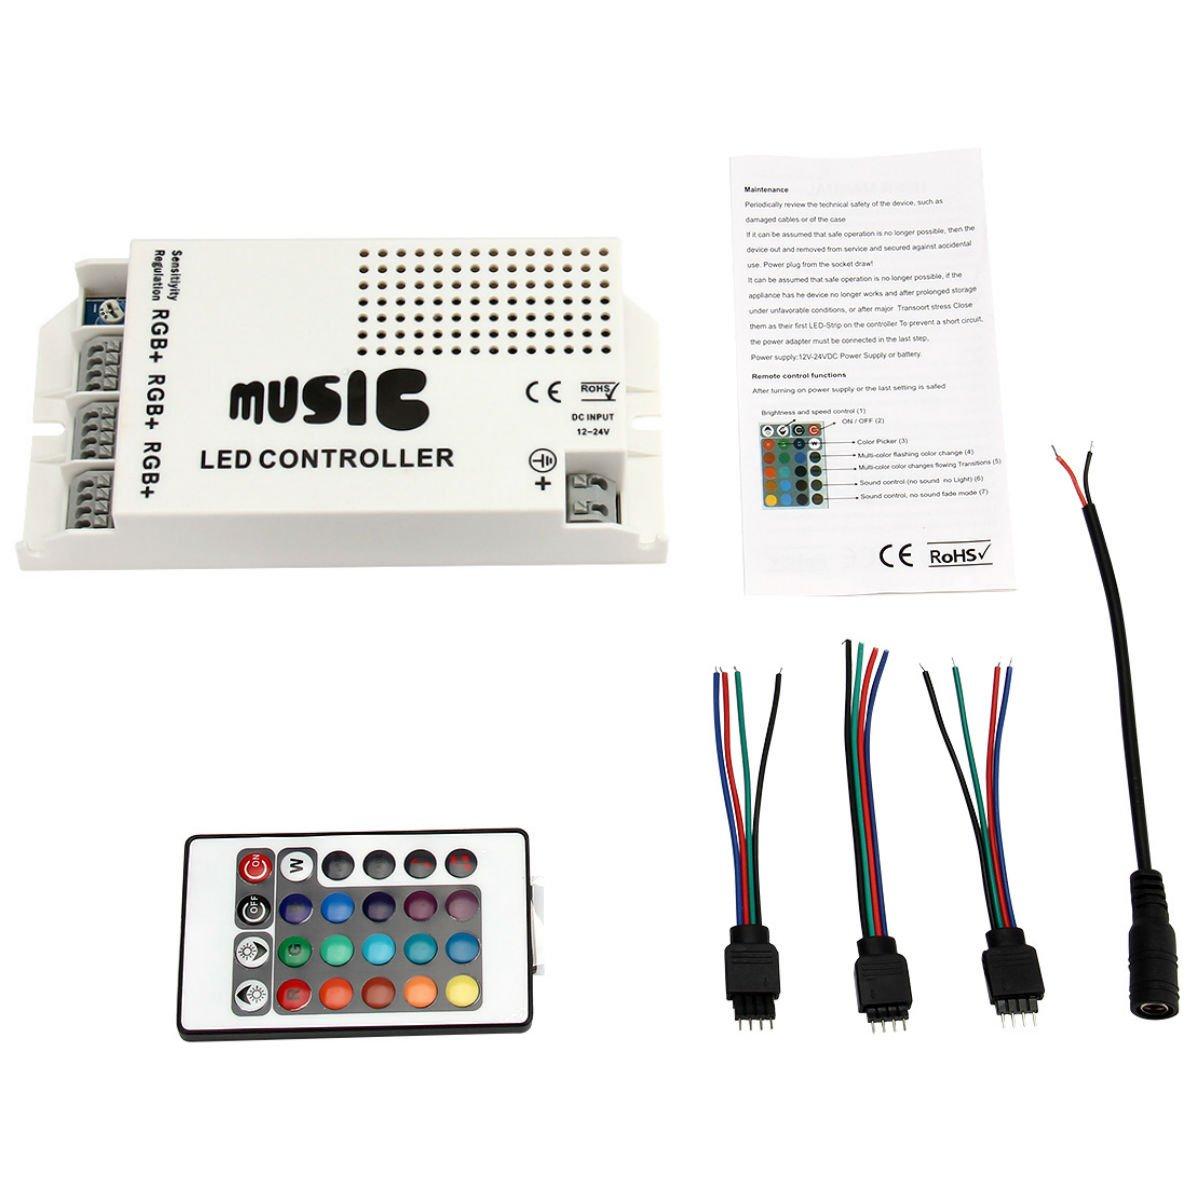 EPBOWPT RGB LED Strip Accessories DC12-24V LED Music Sound Controller, Dimmer, RGB 3-Way Output, with 24-key IR Remote Control for RGB Light strip(24 Keys IR Music Remote)